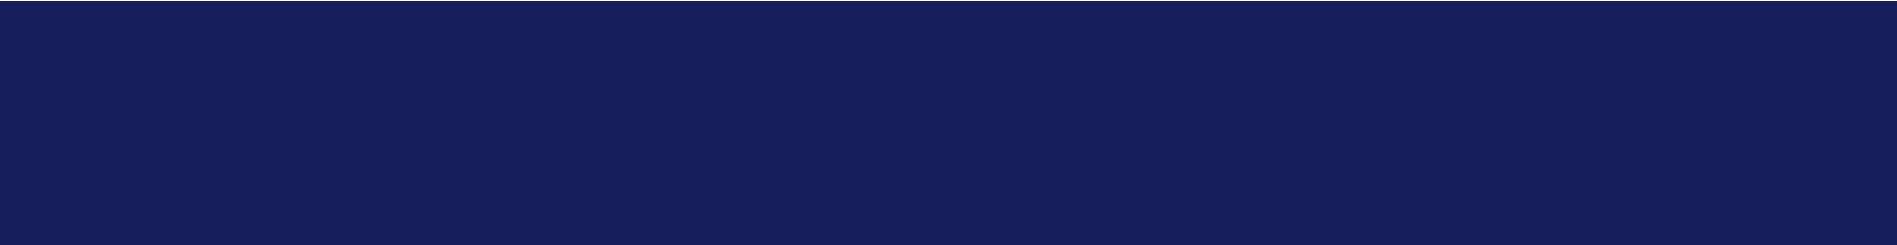 blue back pic.jpg